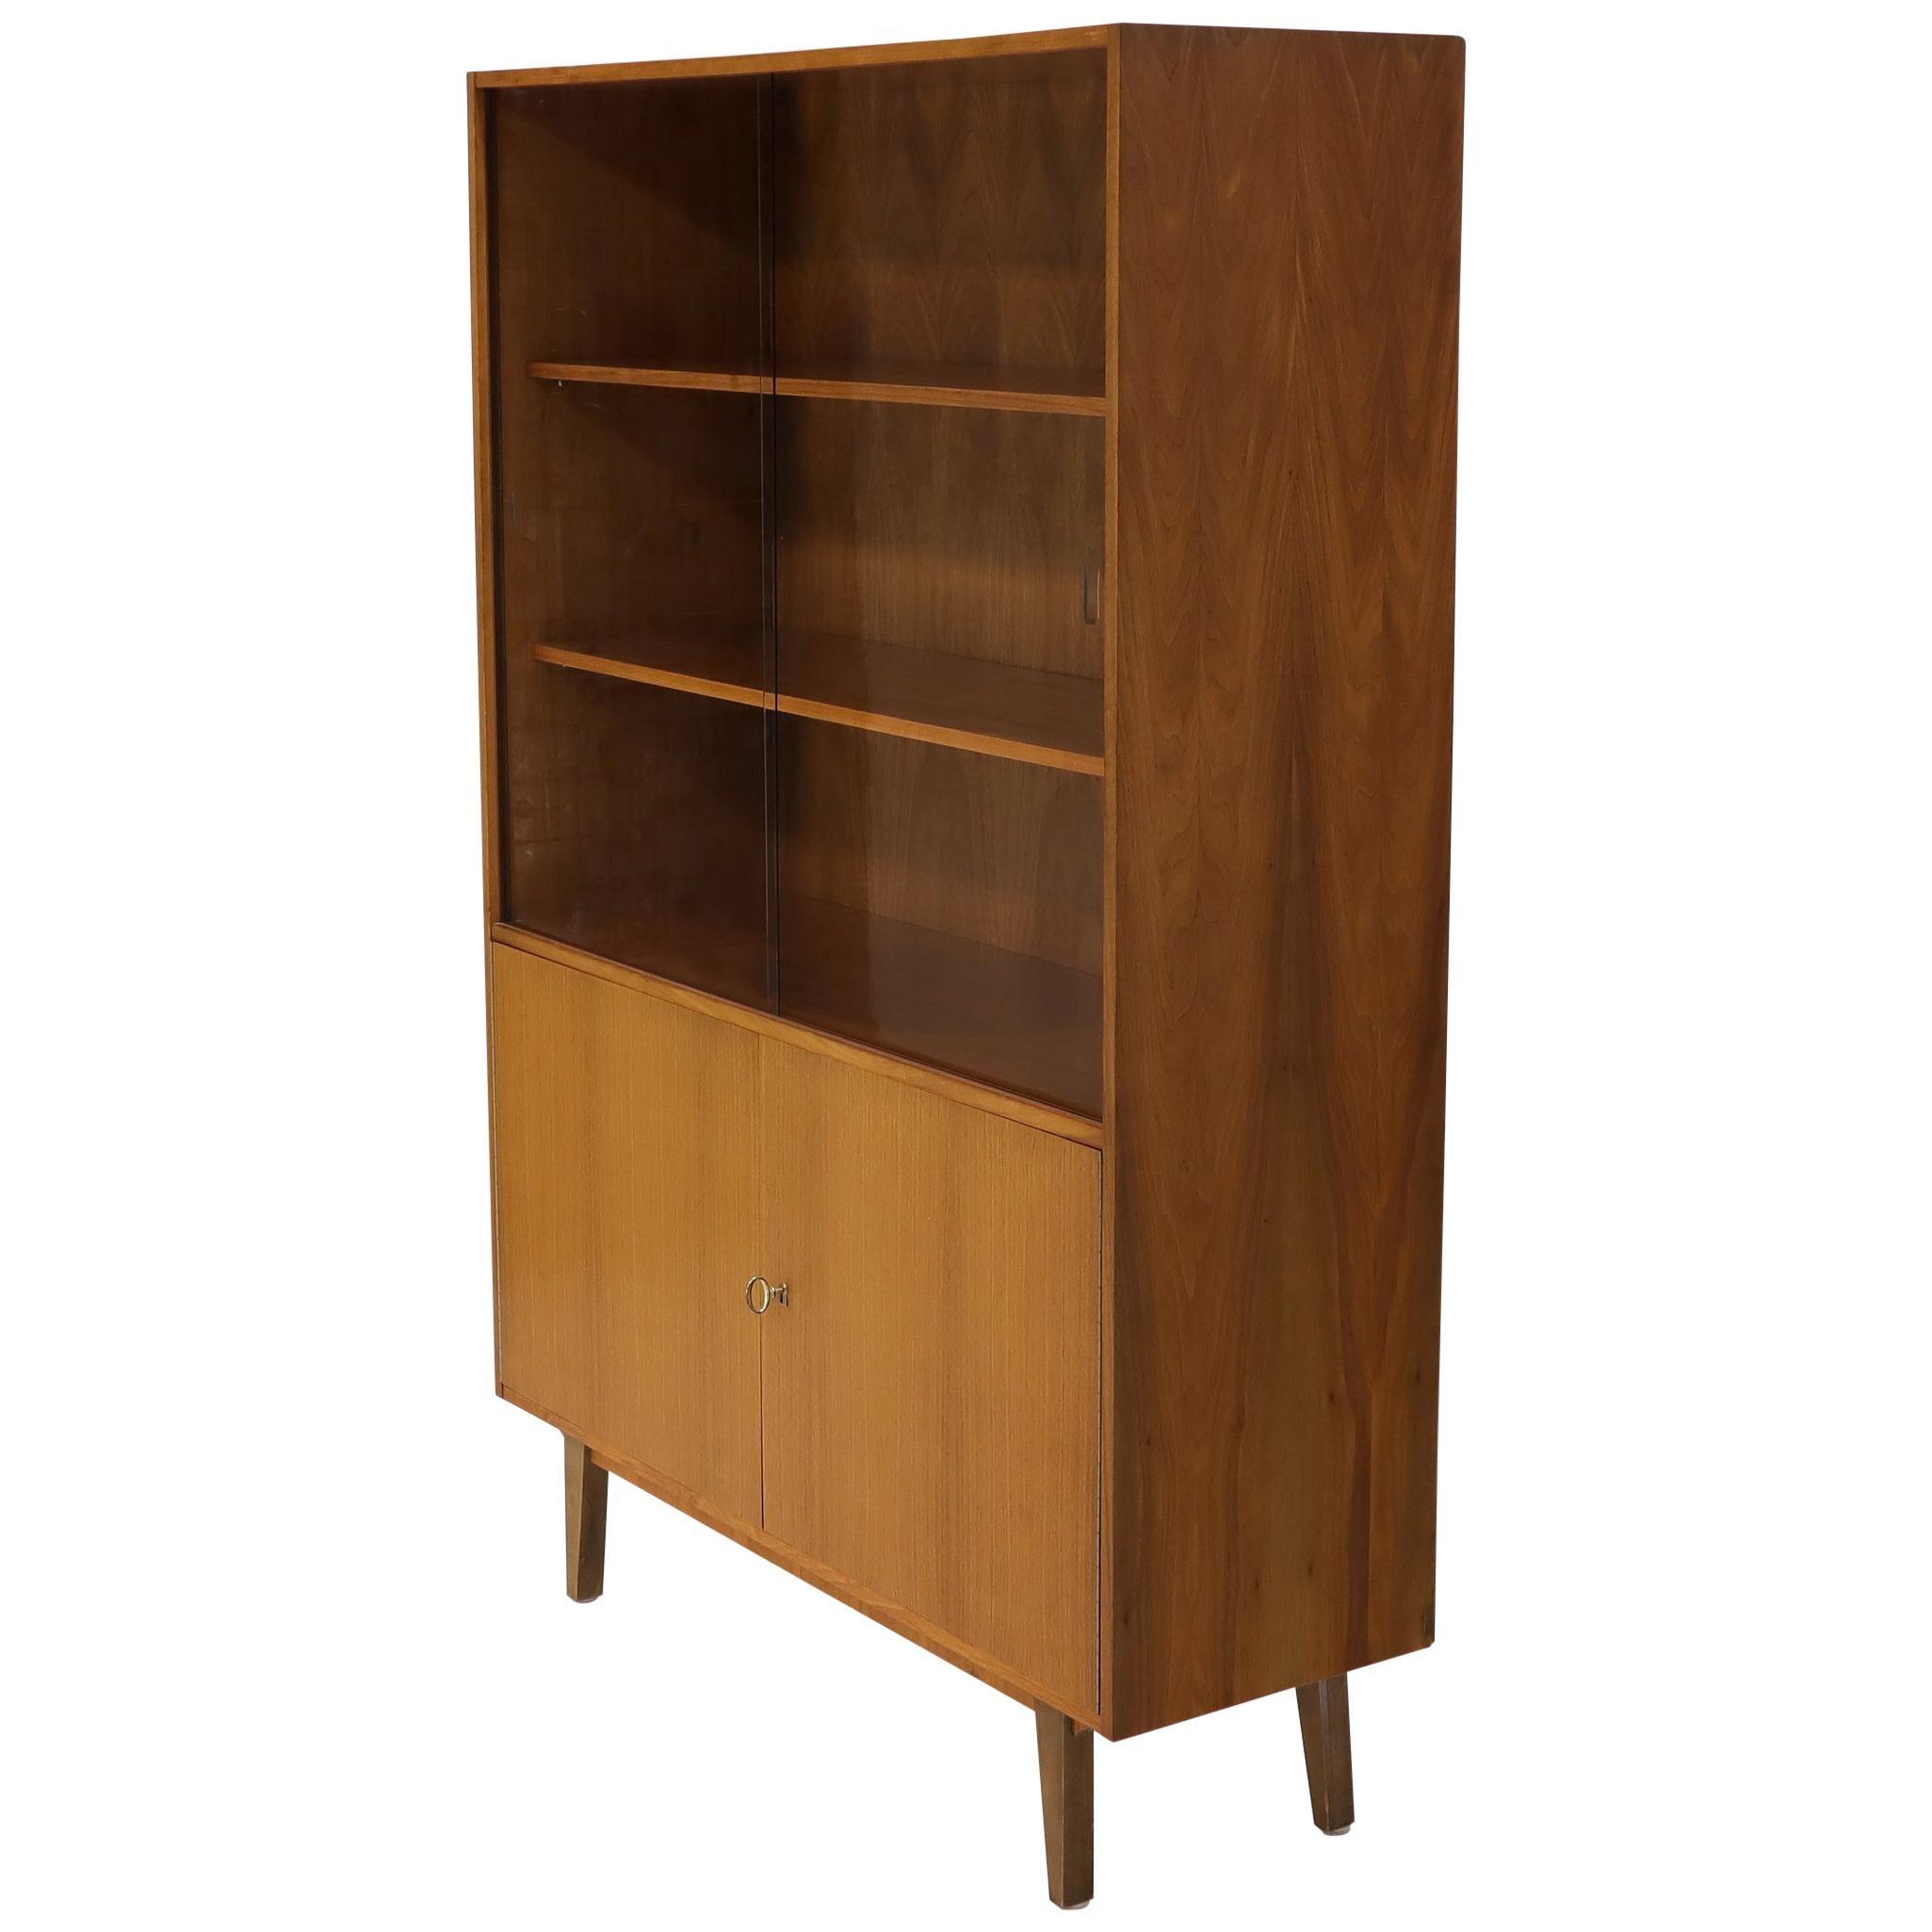 Danish teak Mid-Century Modern Bookcase Cabinet Credenza Hutch Two Glass Doors